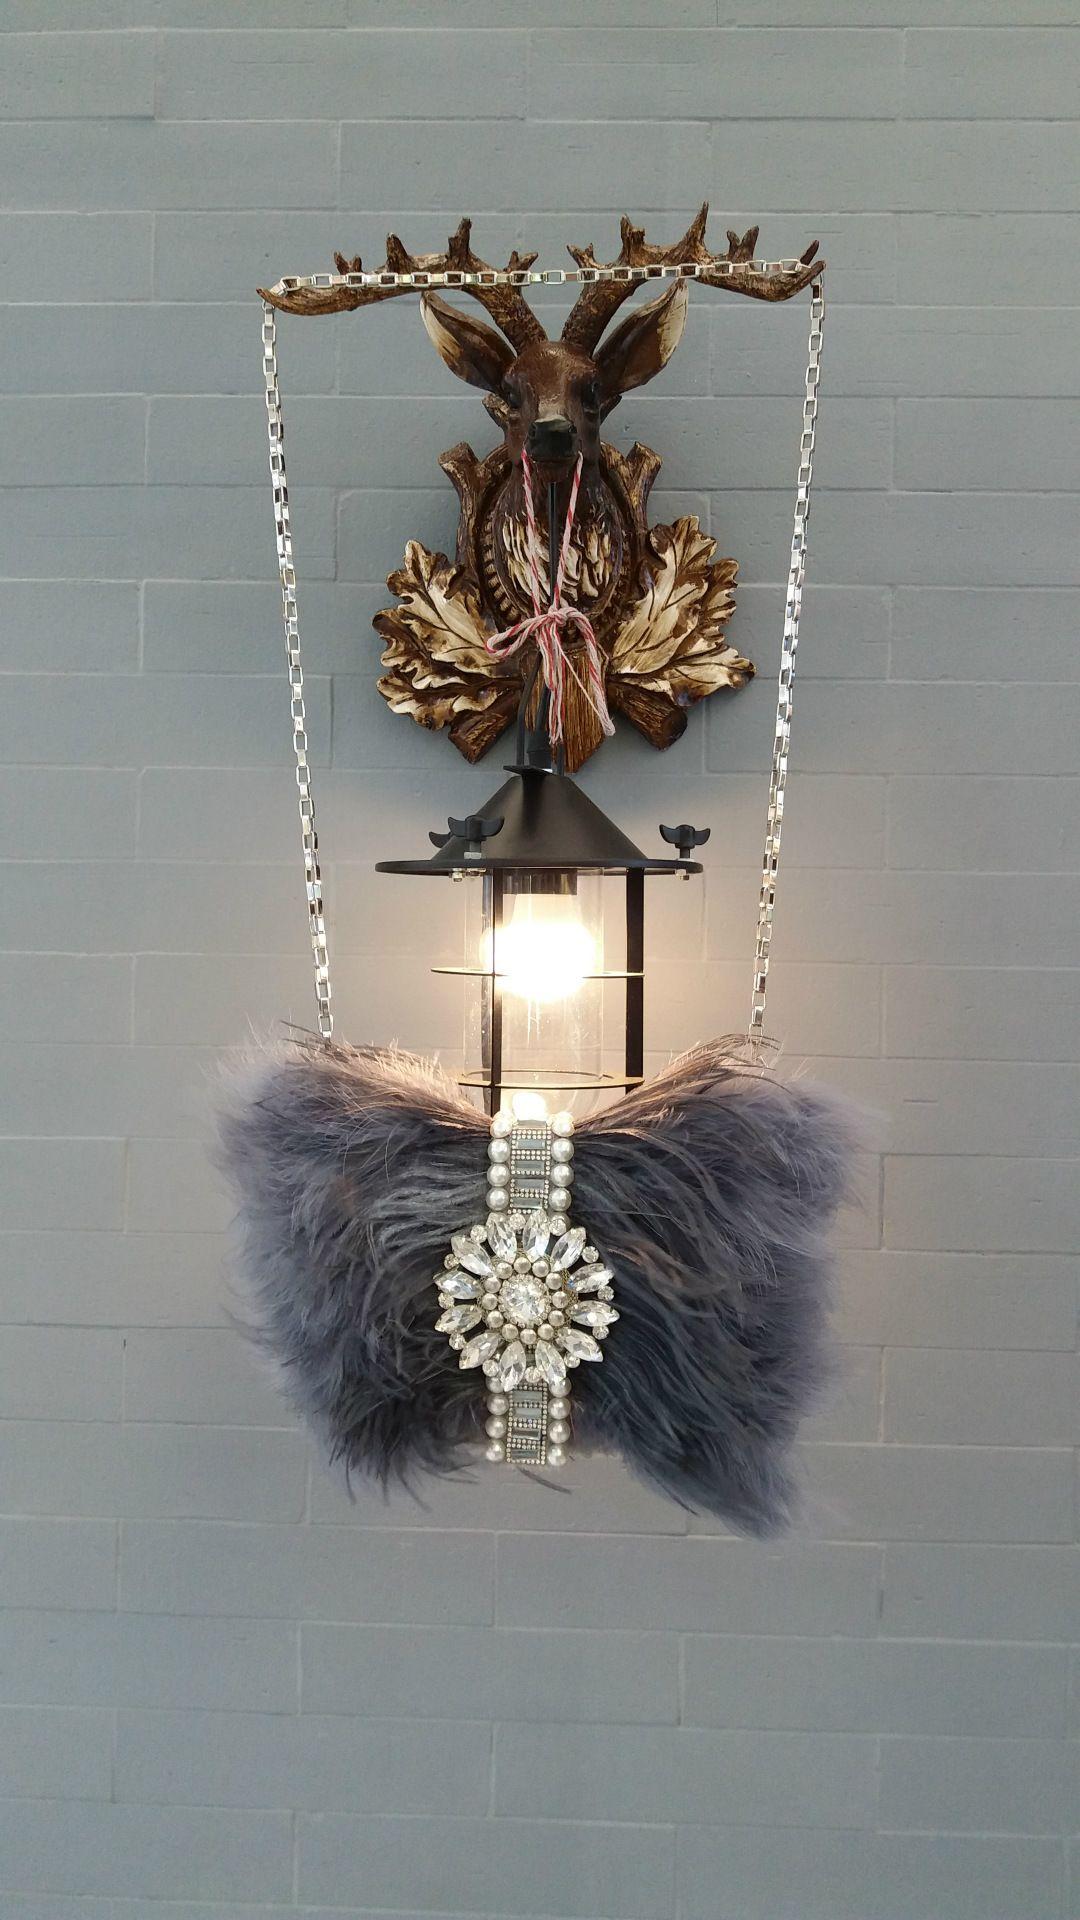 Nova moda strass saco de noite de avestruz saco de penas sacos cadeia ombro diagonal das mulheres